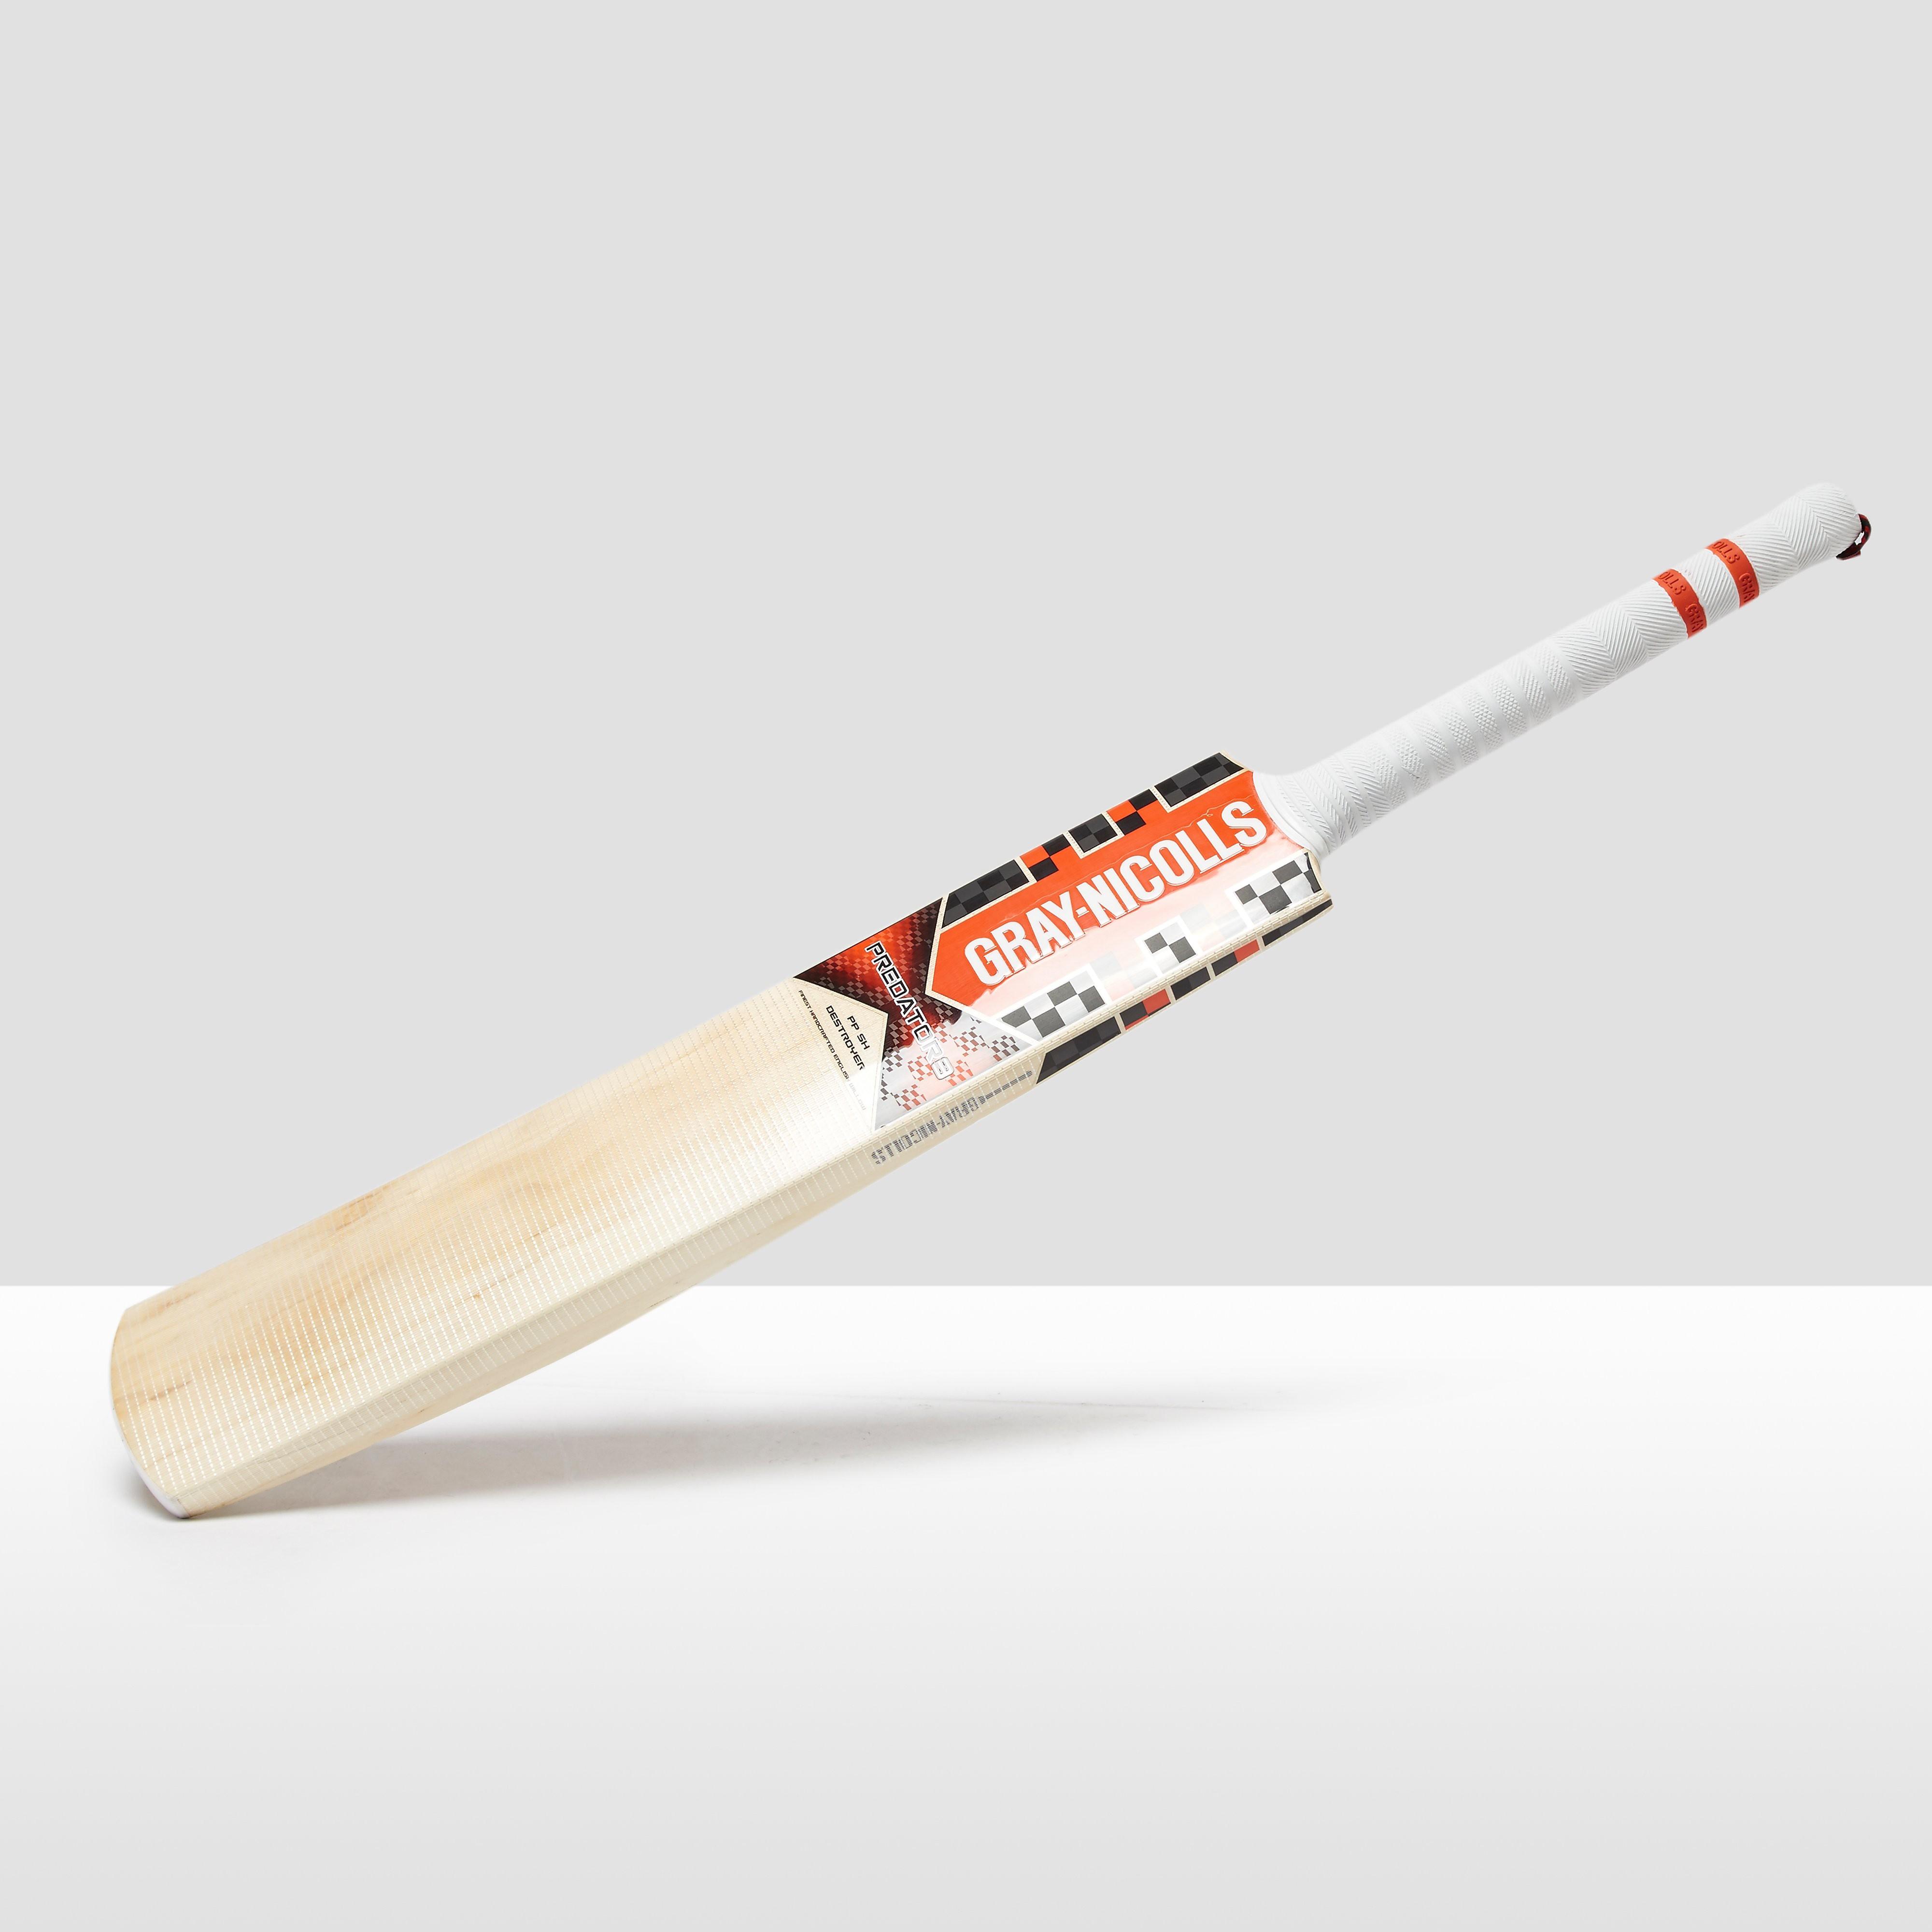 Gray Nicolls Predator 3 Destroyer Men's Cricket Bat